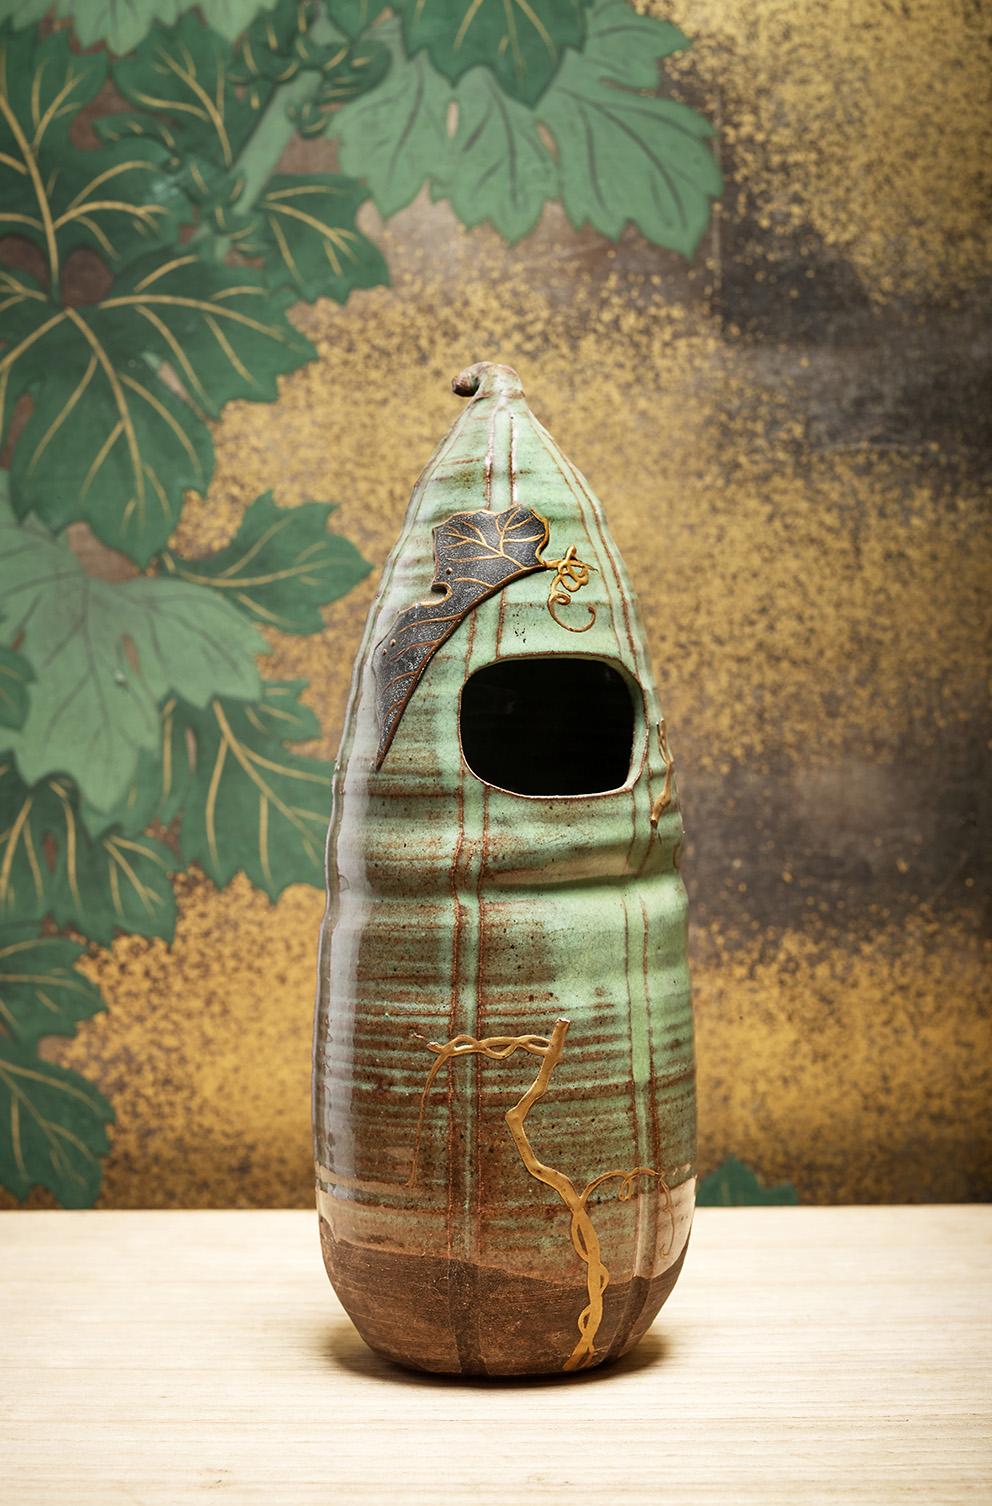 Kyoto, Japan, end of the Edo period (1603-1868), Hanaike (hanging vase) in green enameled ringed stoneware, h. 24.5 cm (Tessier Sarrou & A